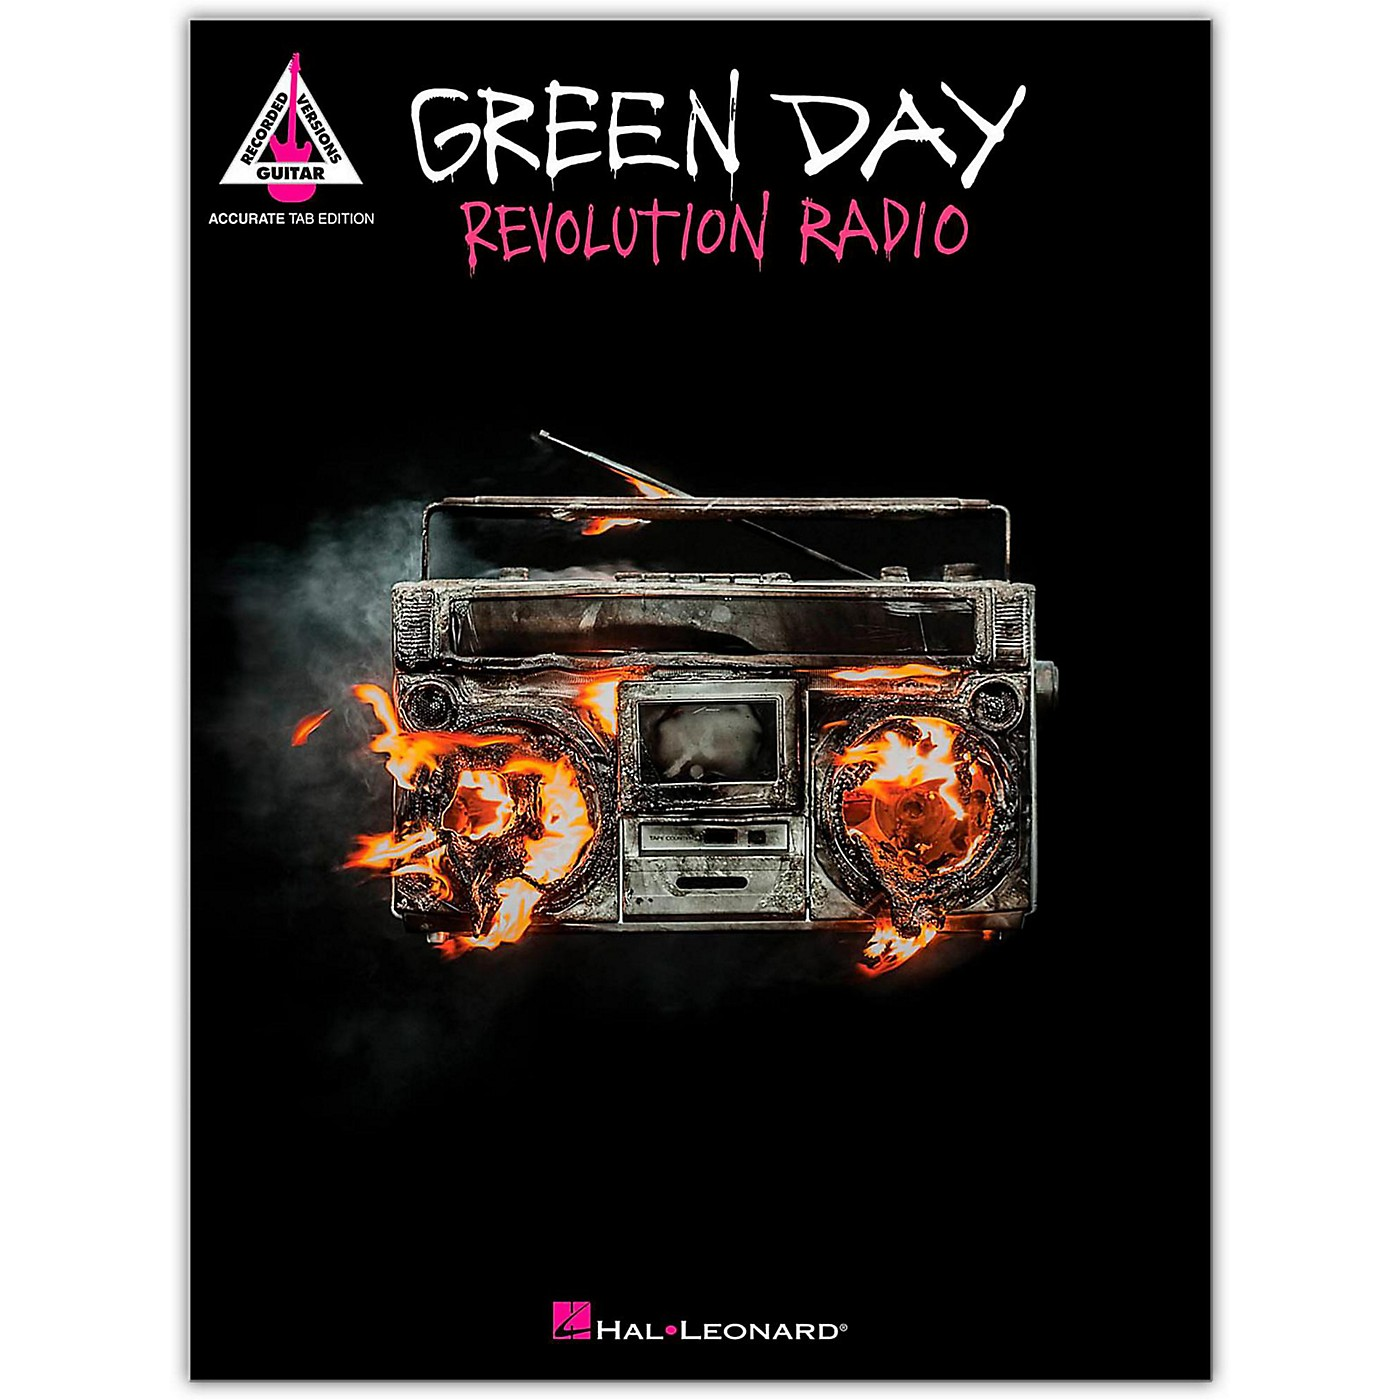 Hal Leonard Green Day - Revolution Radio for Guitar Tab thumbnail